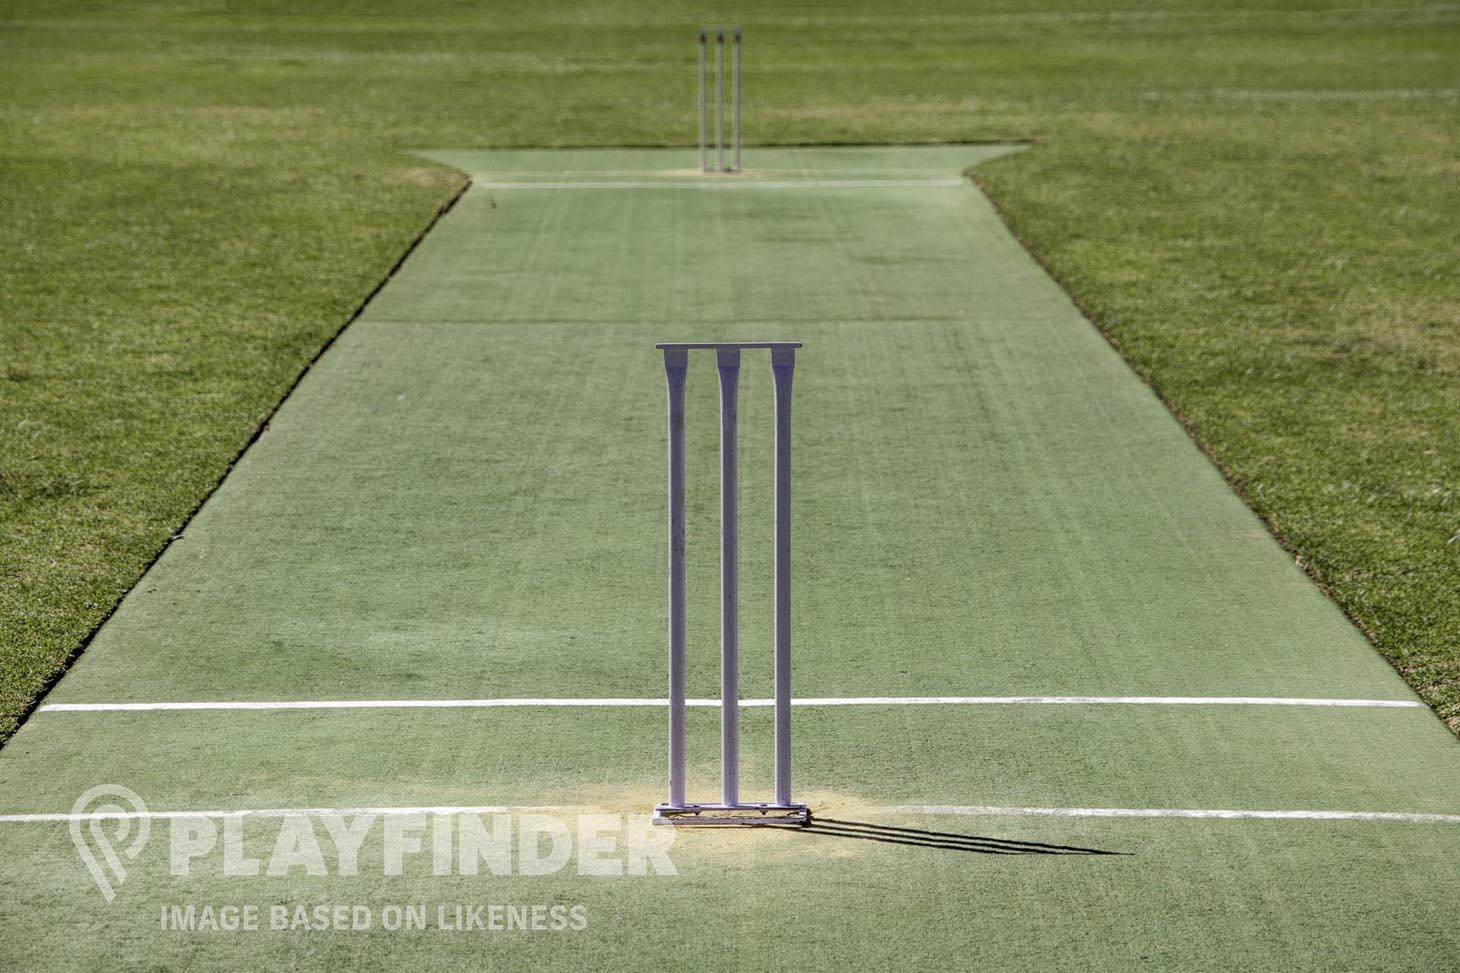 Marlay Park Outdoor | Grass cricket facilities